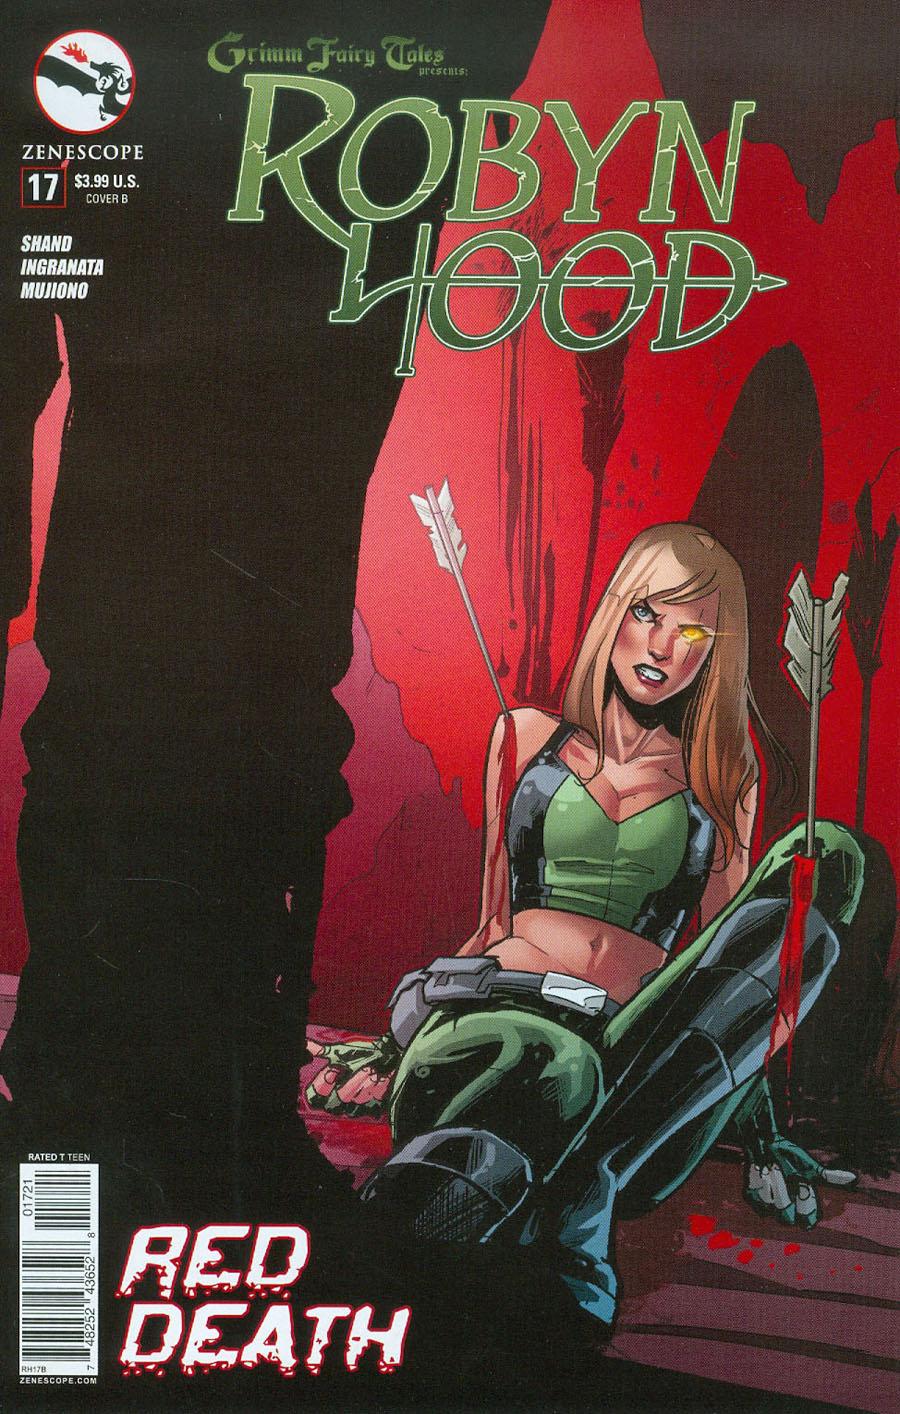 Grimm Fairy Tales Presents Robyn Hood Vol 2 #17 Cover B Roberta Ingranata